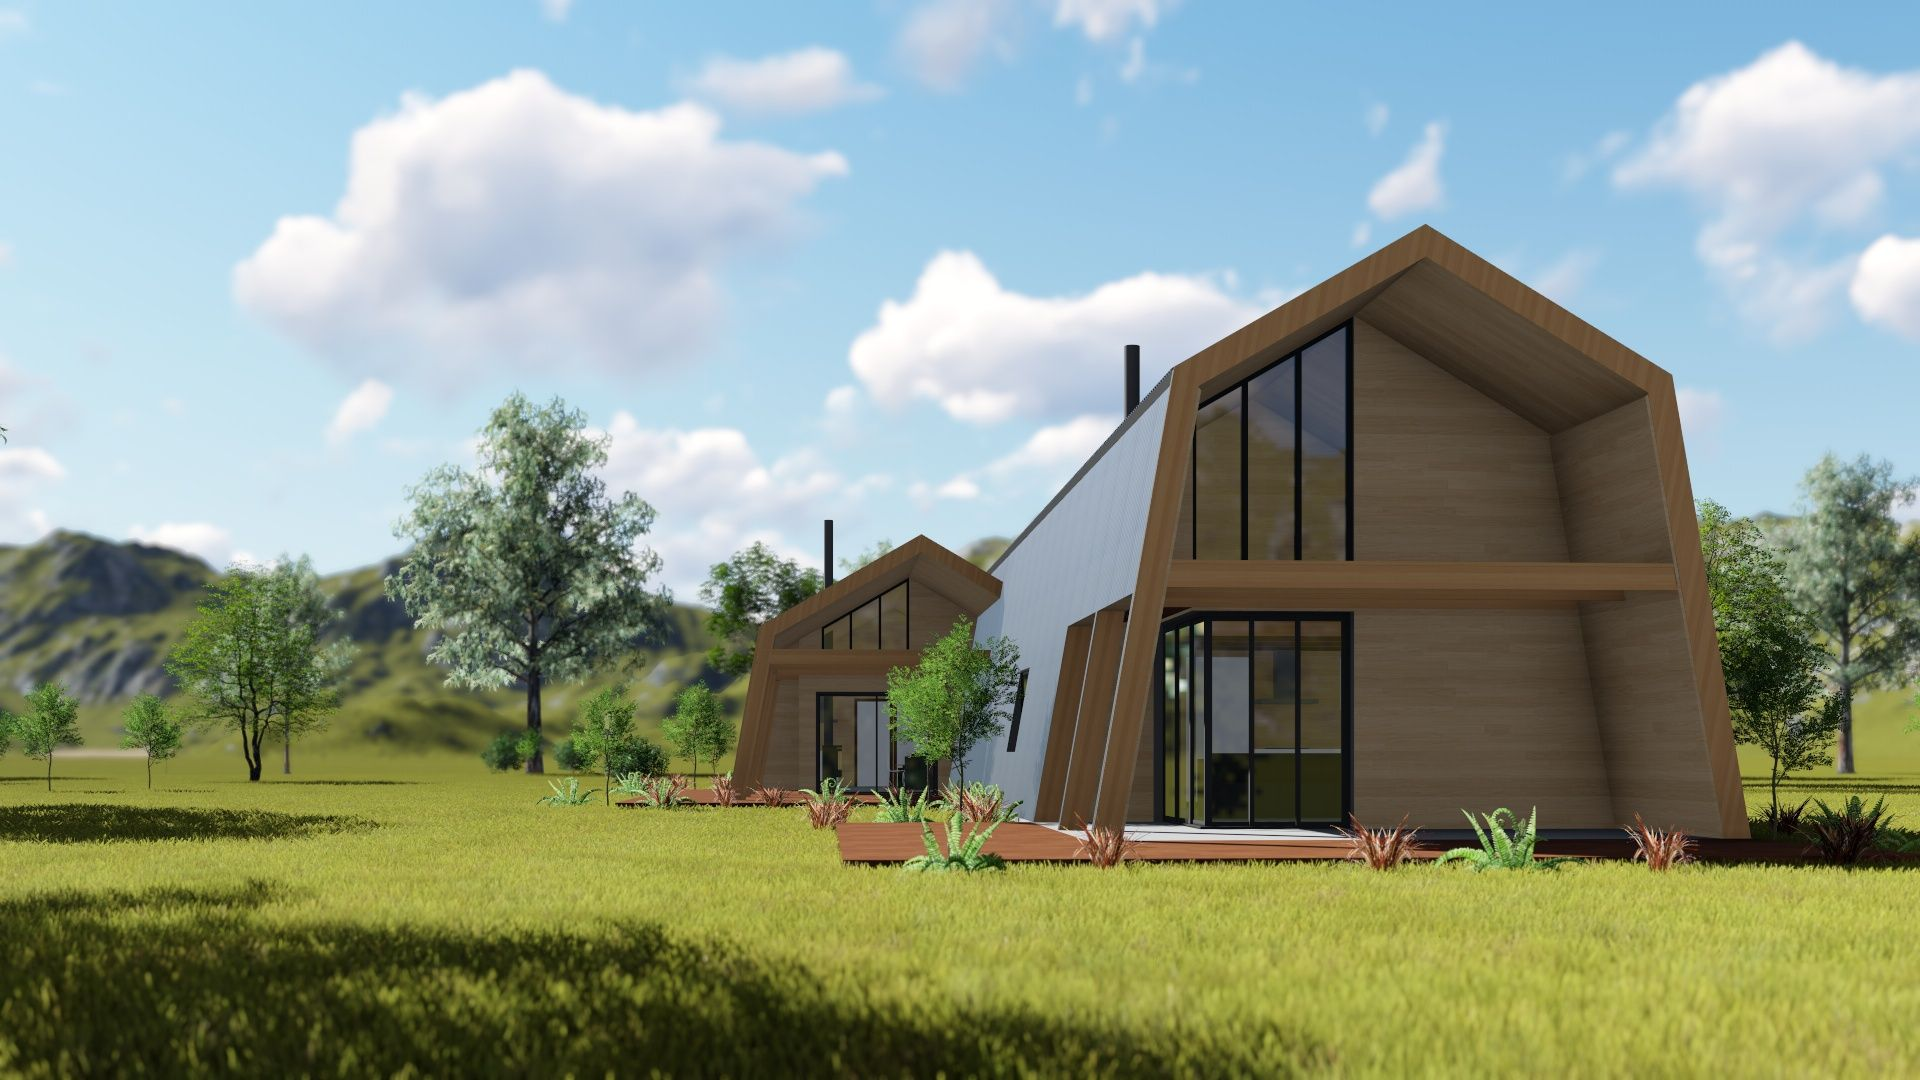 This Eco-Friendly DIY House Kit Starts at $200,000 | Kit ...